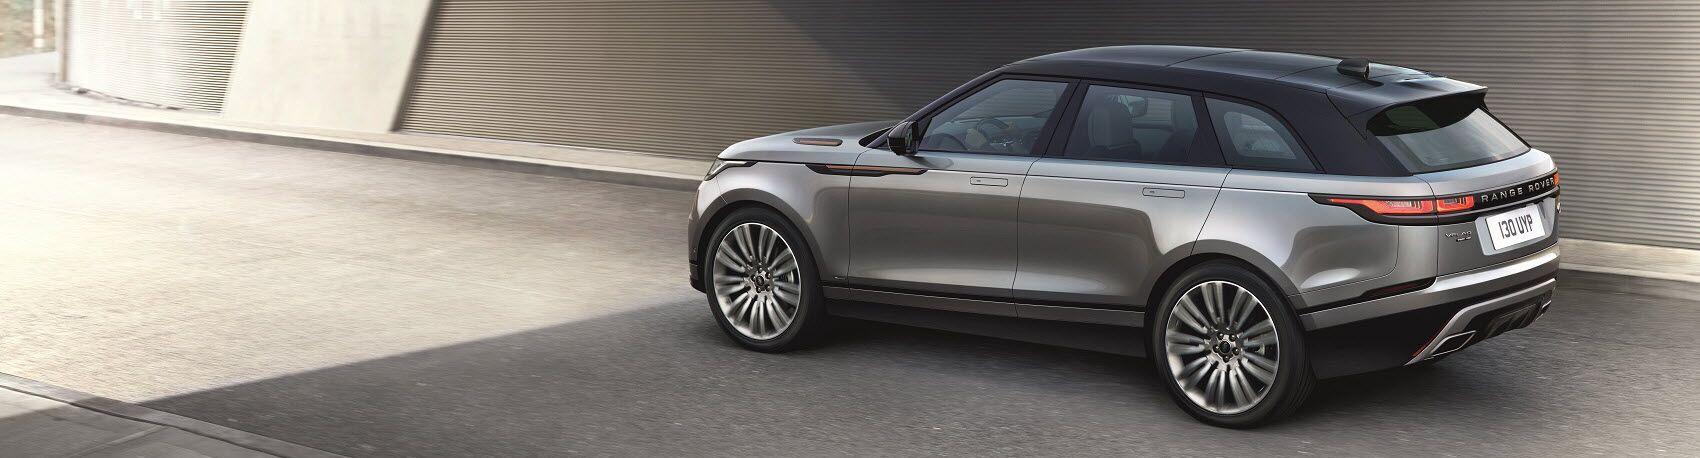 Range Rover Velar vs Discovery